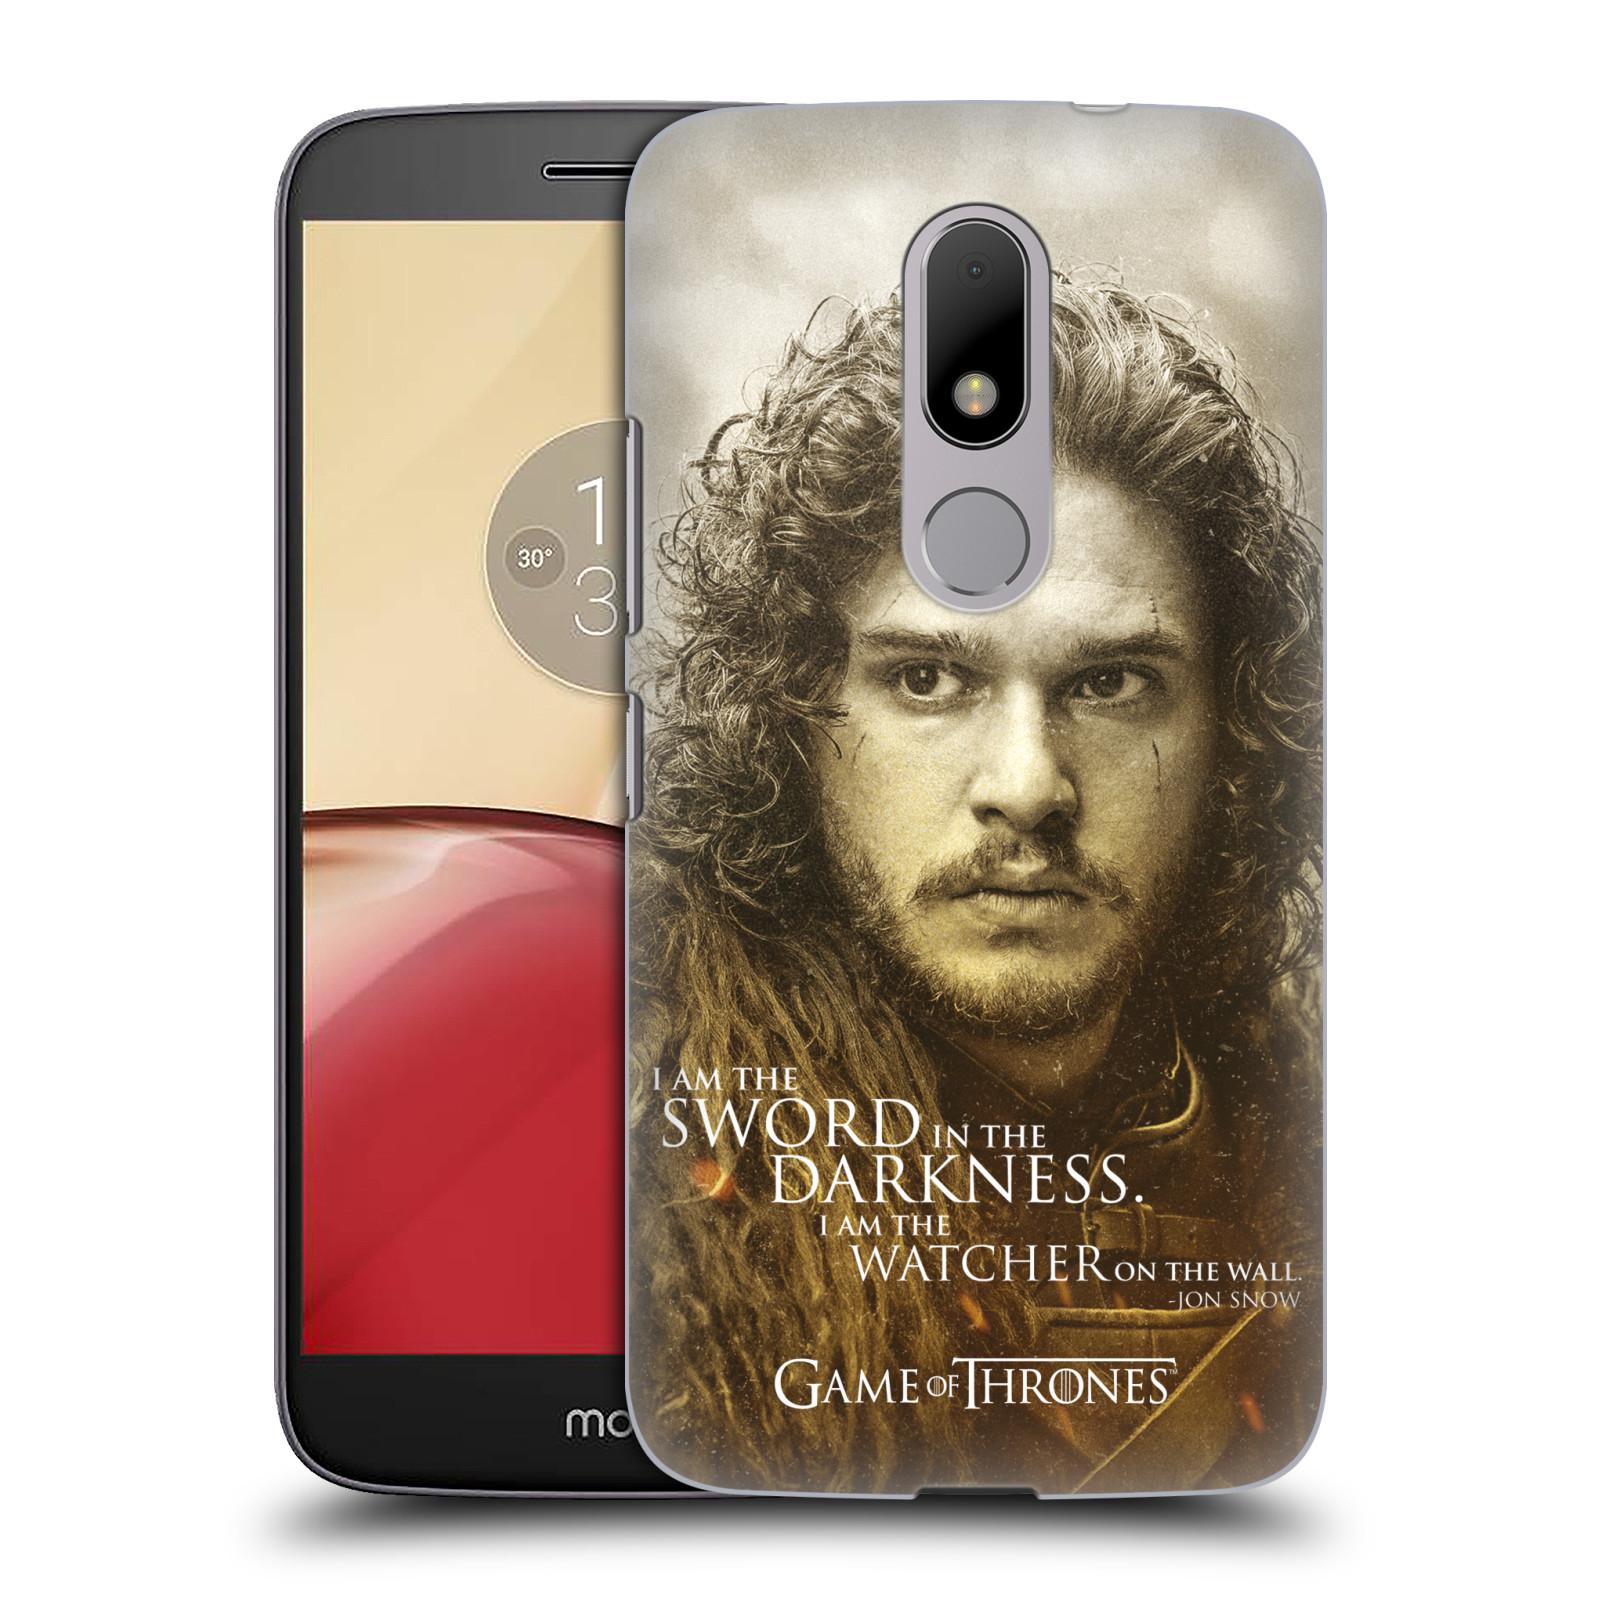 Plastové pouzdro na mobil Lenovo Moto M HEAD CASE Hra o trůny - Jon Snow (Plastový kryt či obal na mobilní telefon s licencovaným motivem Hra o trůny - Game Of Thrones pro Lenovo (Motorola) Moto M / Moto M Dual SIM)